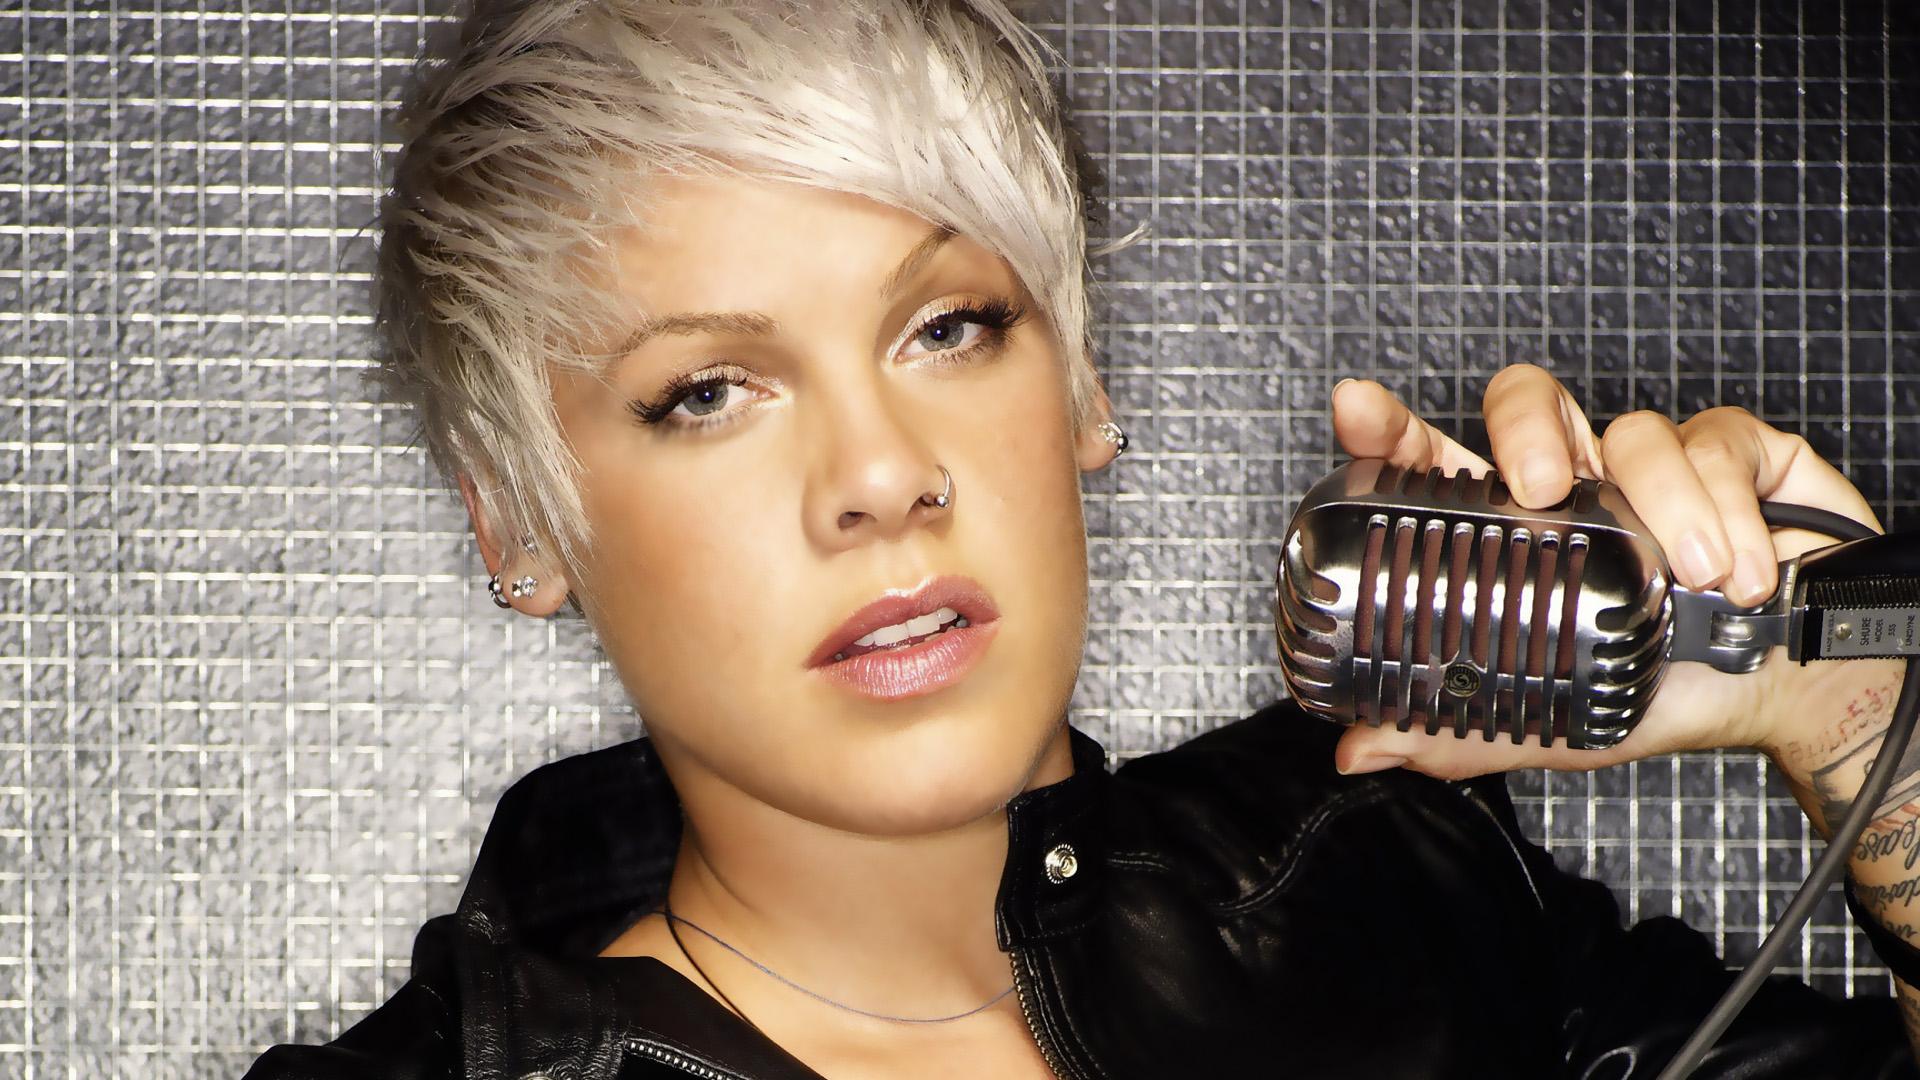 P Nk Hairstyles: Music Fanart